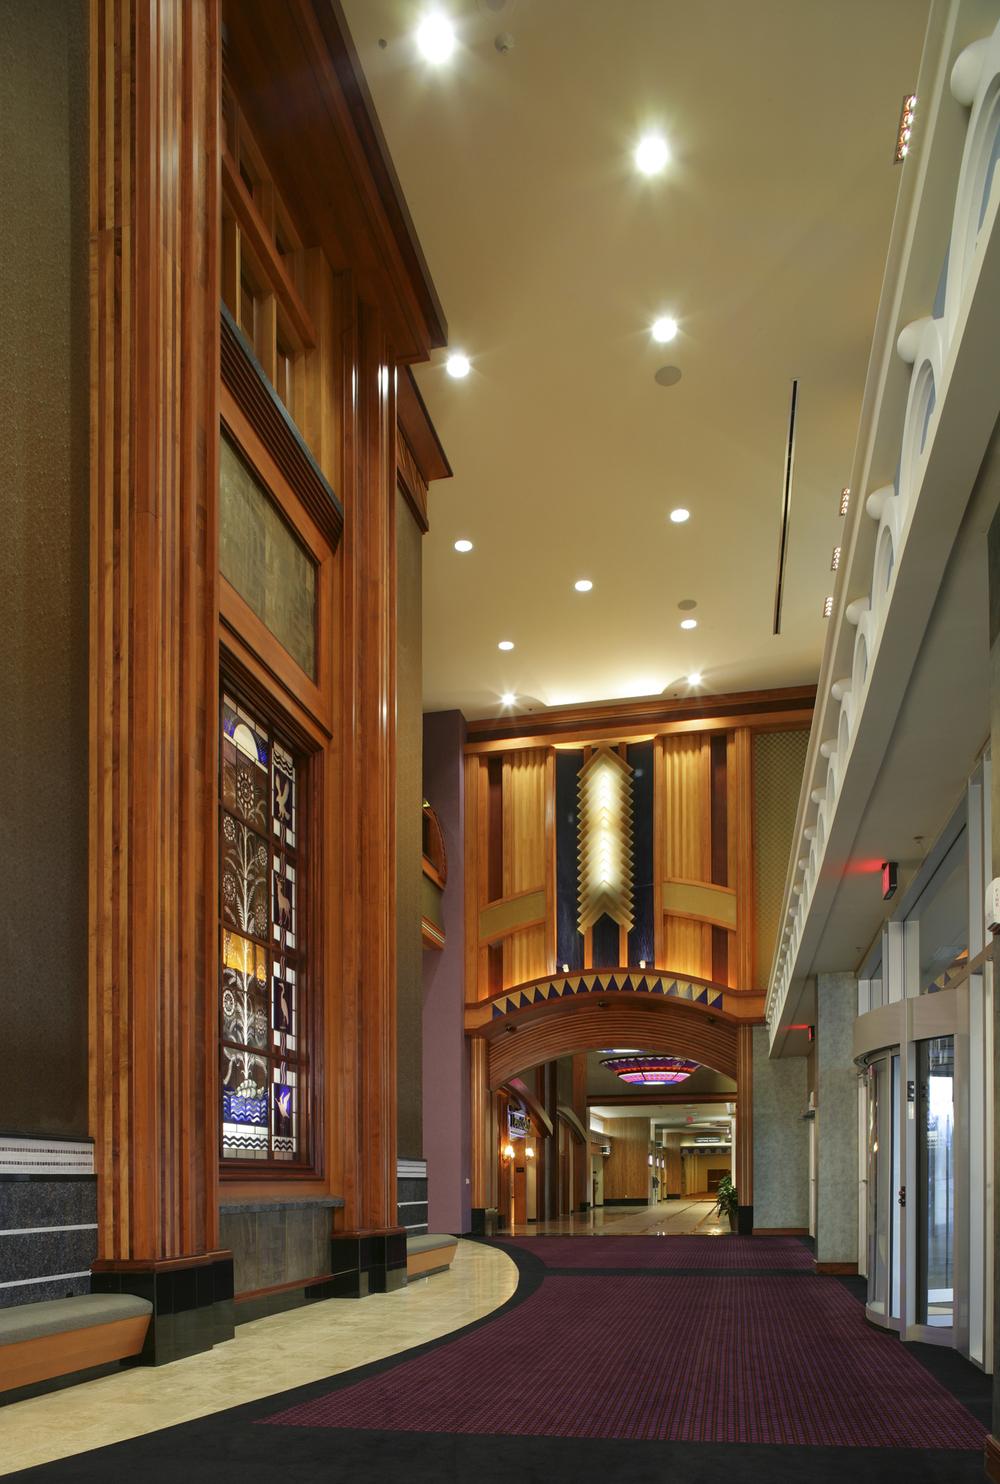 Sen_NiagaraP2_03-Lobby2.jpg